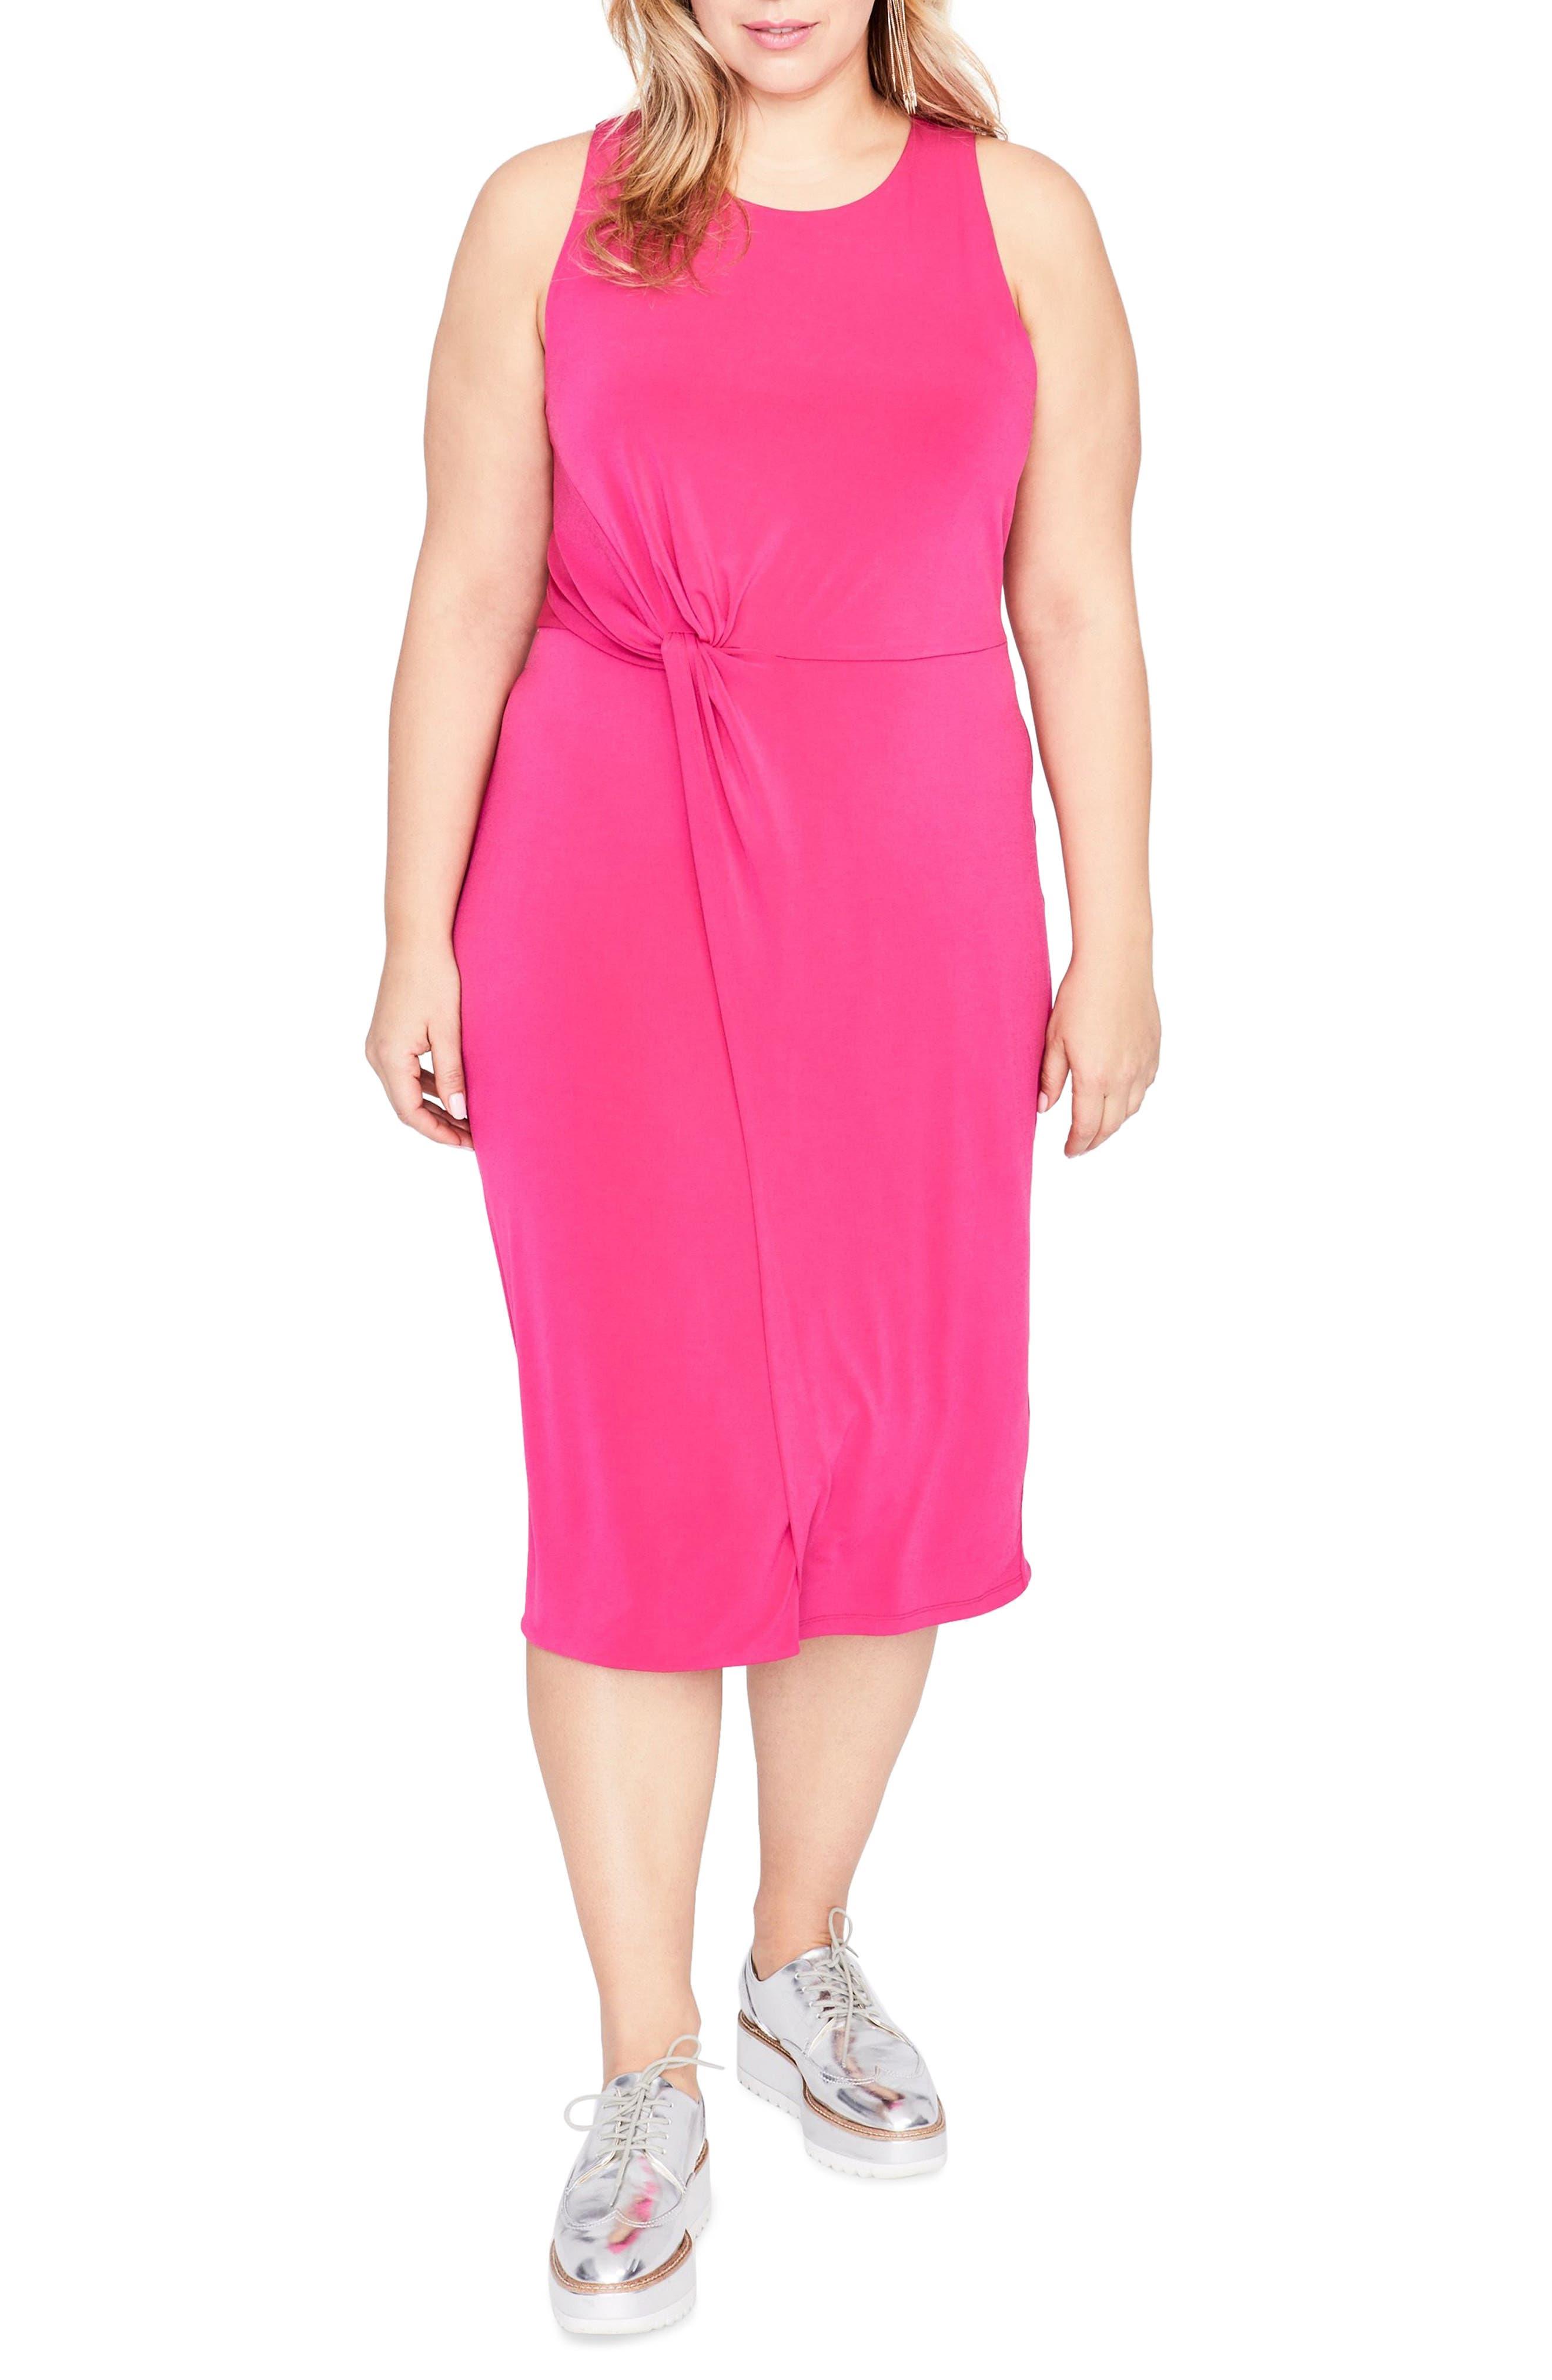 Plus Size Rachel Rachel Roy Twist Front Dress, Pink